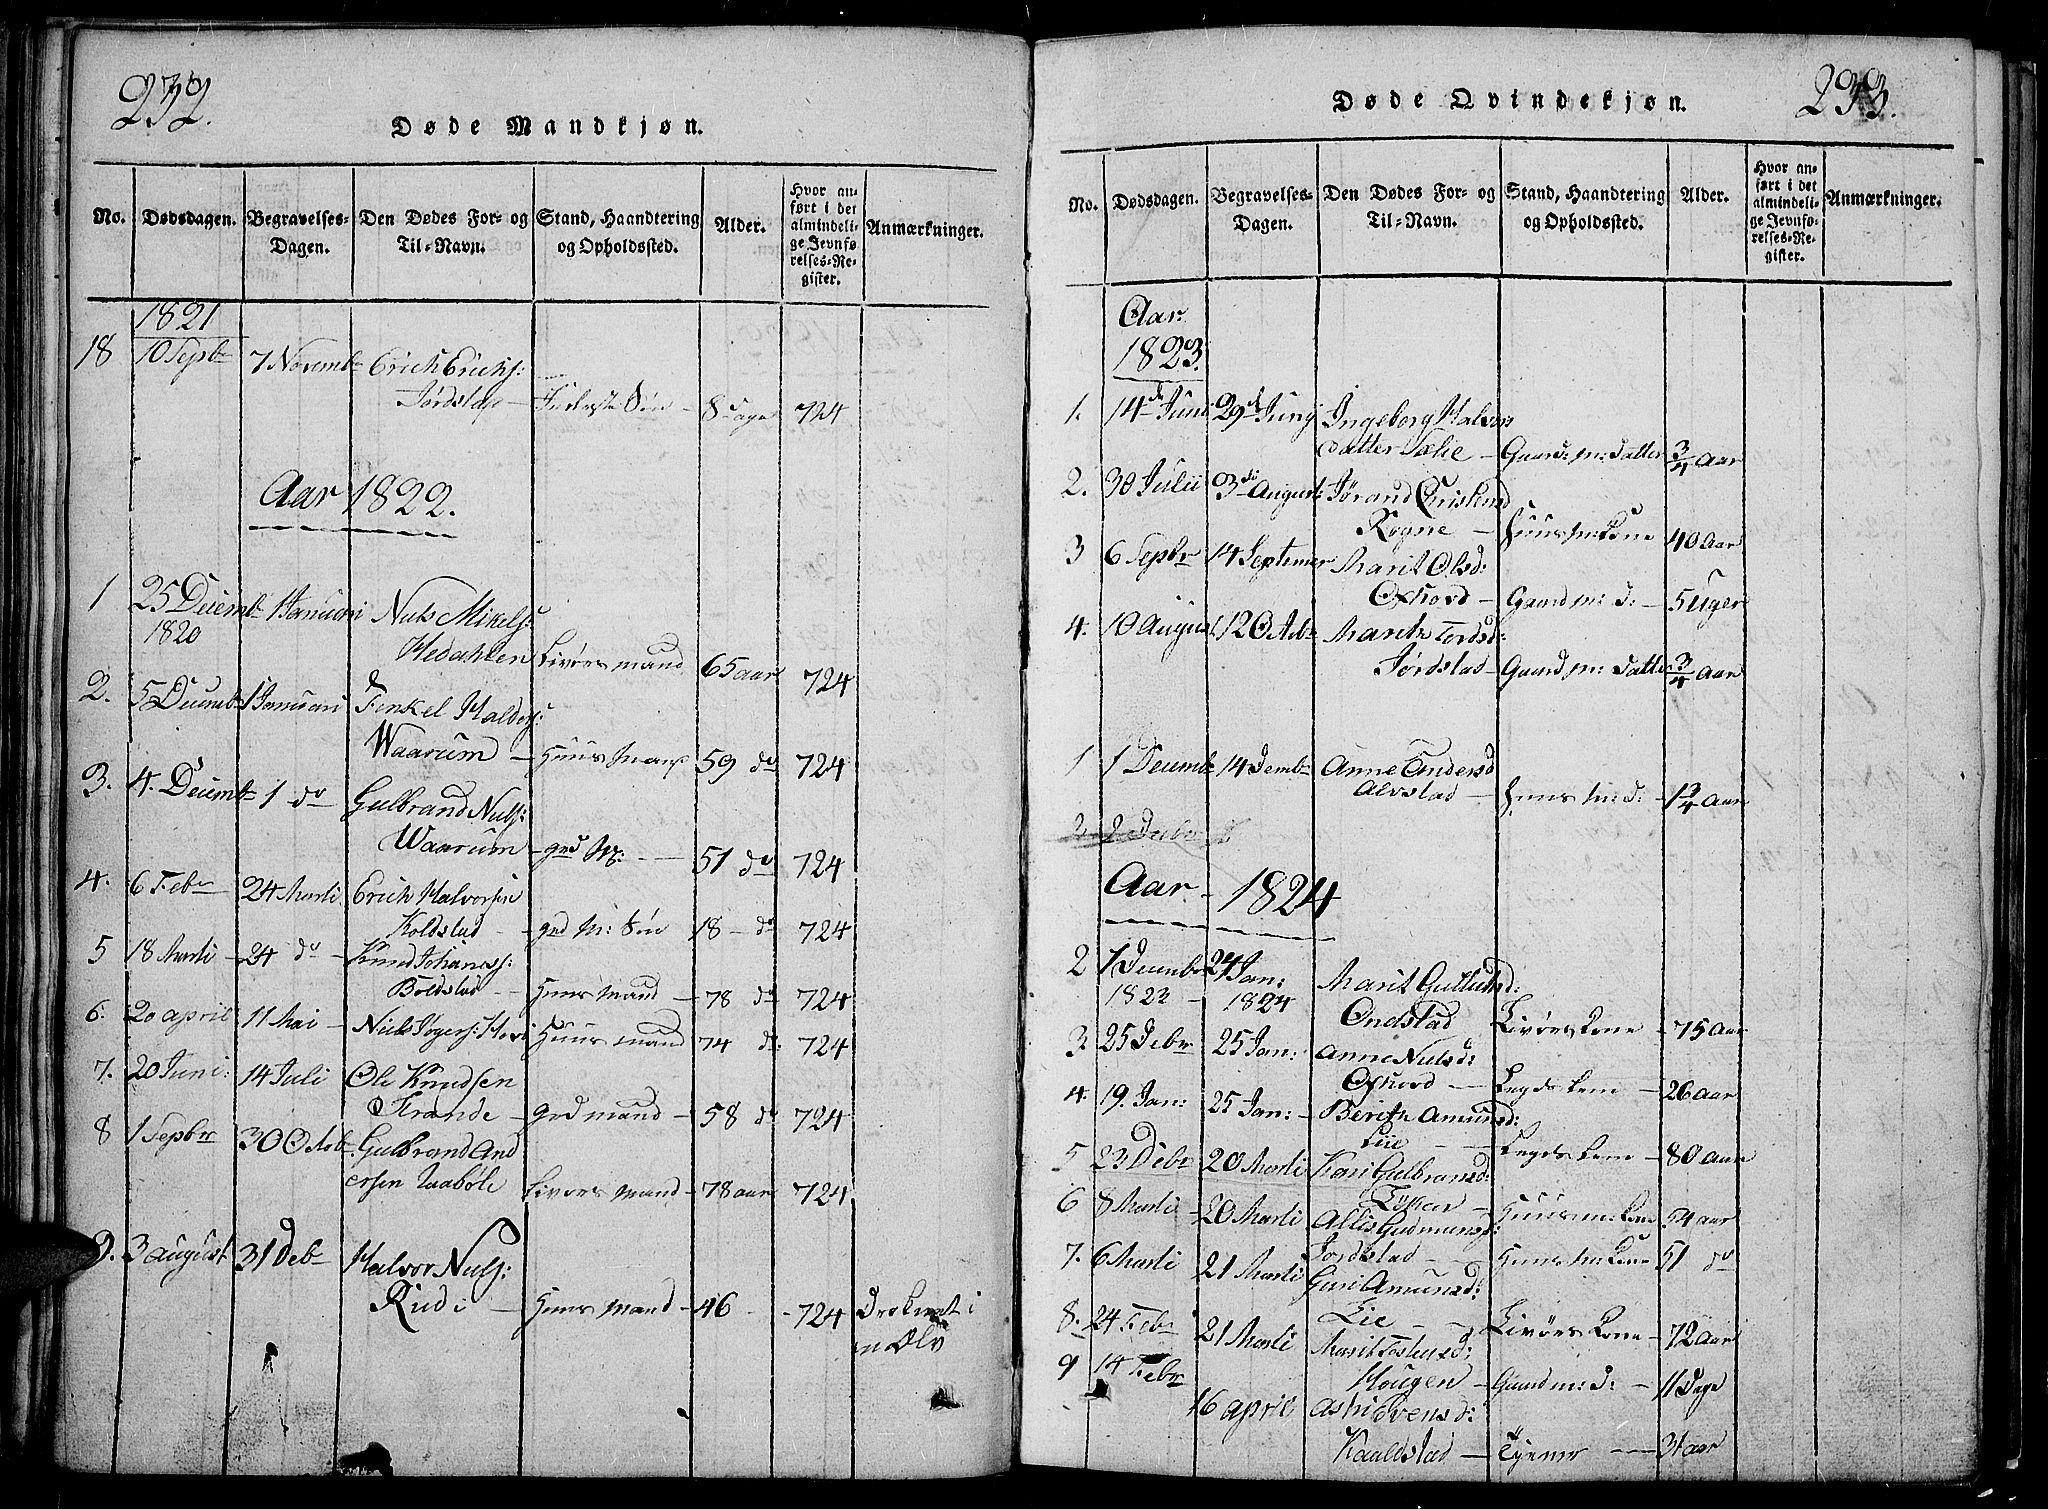 SAH, Slidre prestekontor, Klokkerbok nr. 2, 1814-1839, s. 232-233